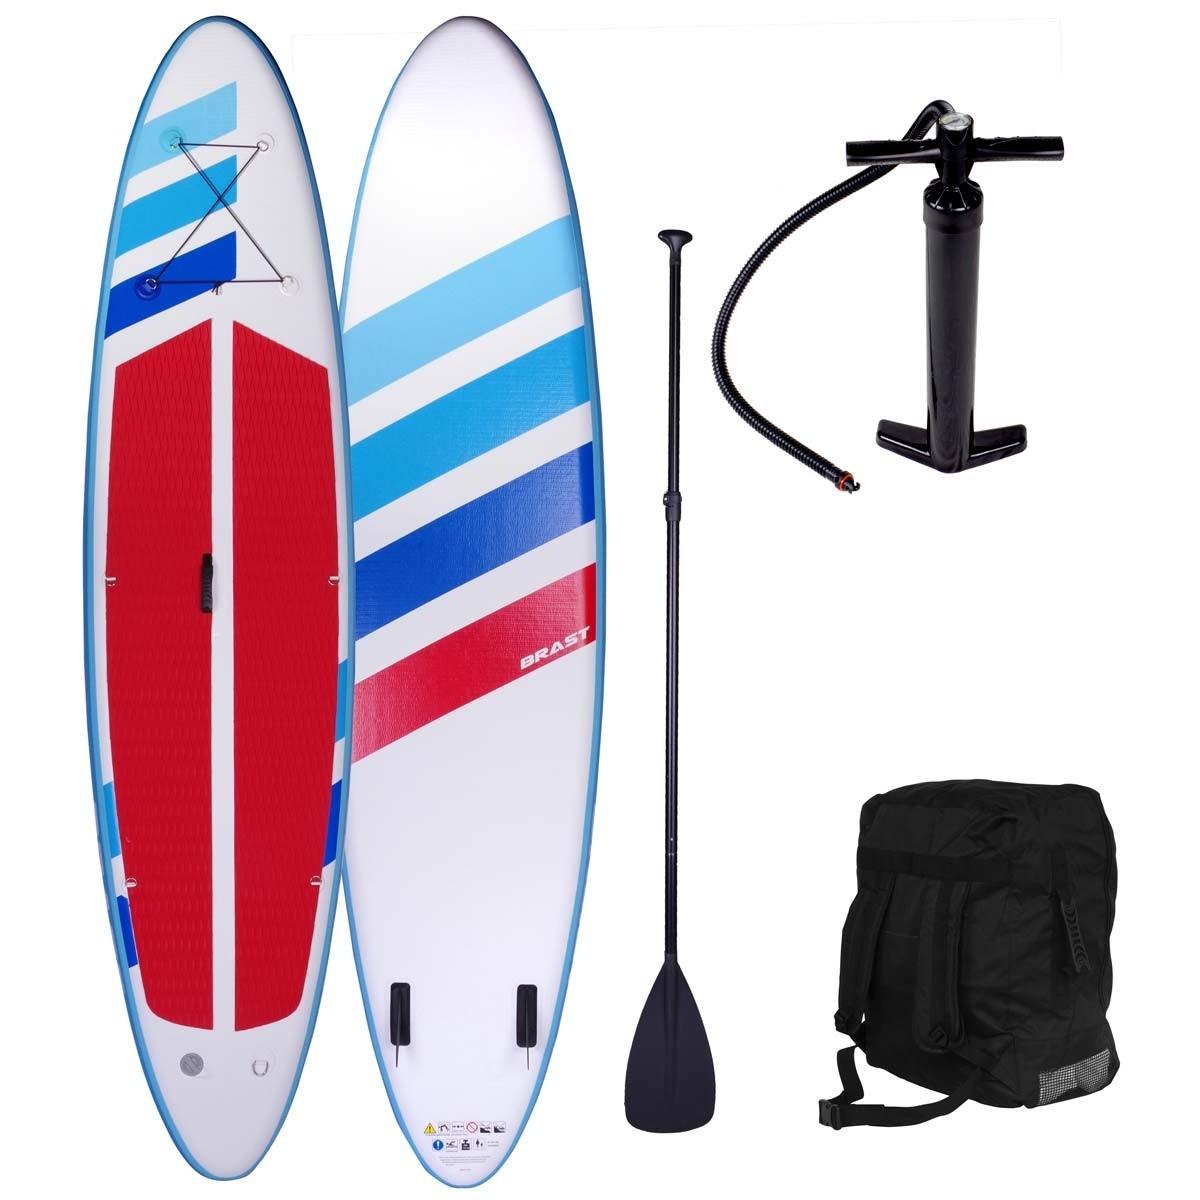 Faltbares SUP-Board BRAST 320cm aufblasbar